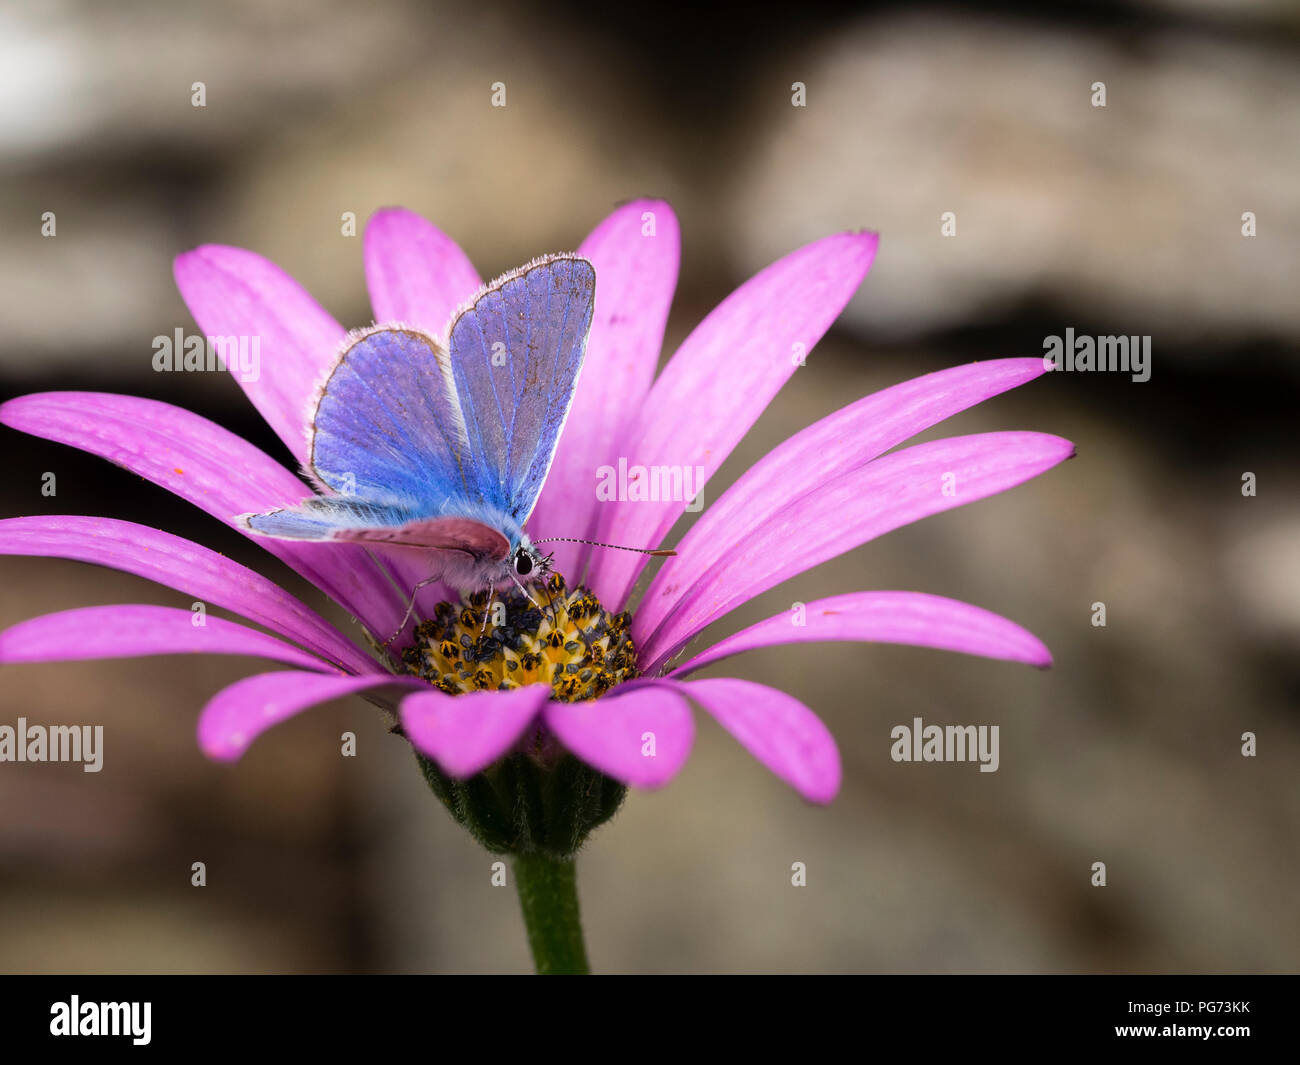 Male common blue butterfly, Polyommatus icarus, feeding on the nectar of the cape daisy, Osteospermum 'Tresco Purple' - Stock Image